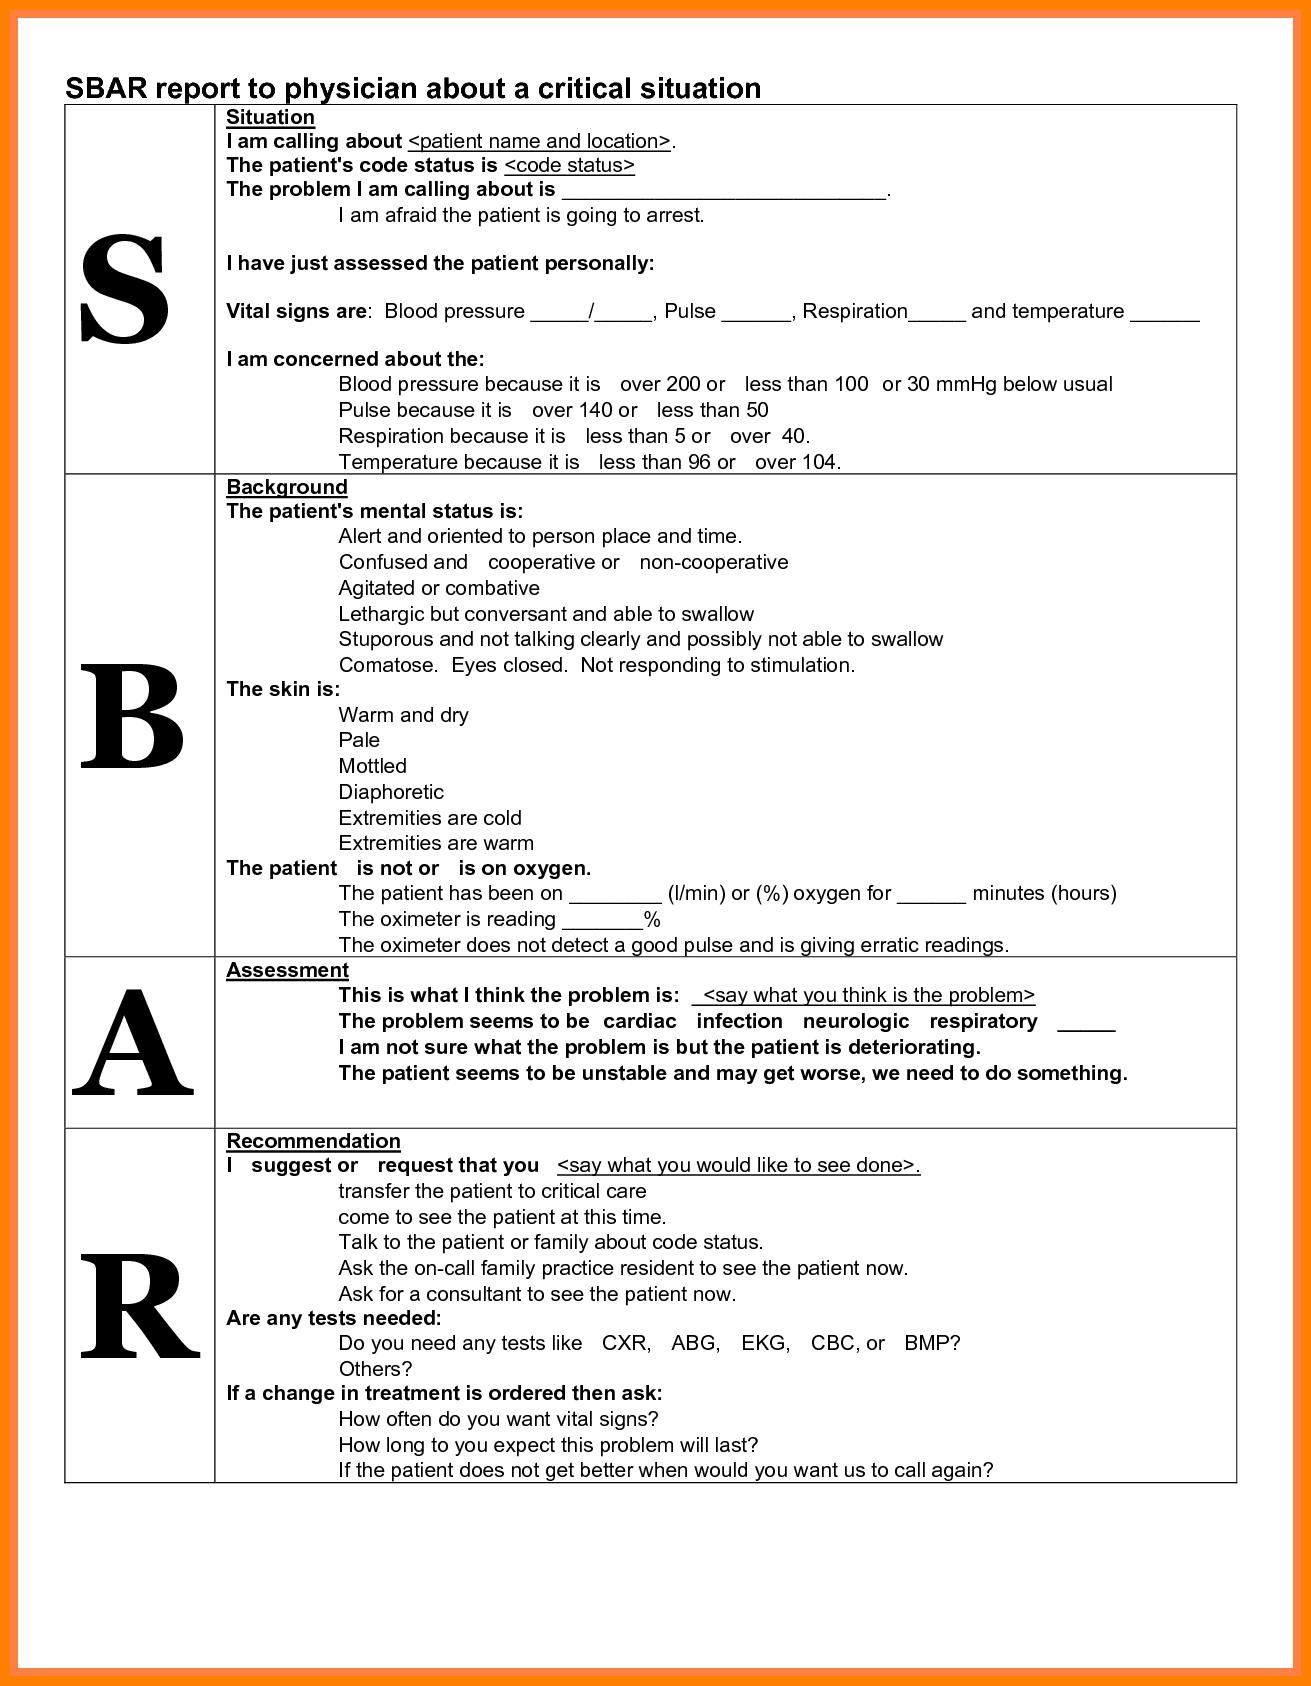 sbar examples nursing home  sbar format - Google Search | Sbar nursing, Sbar, Charting ..